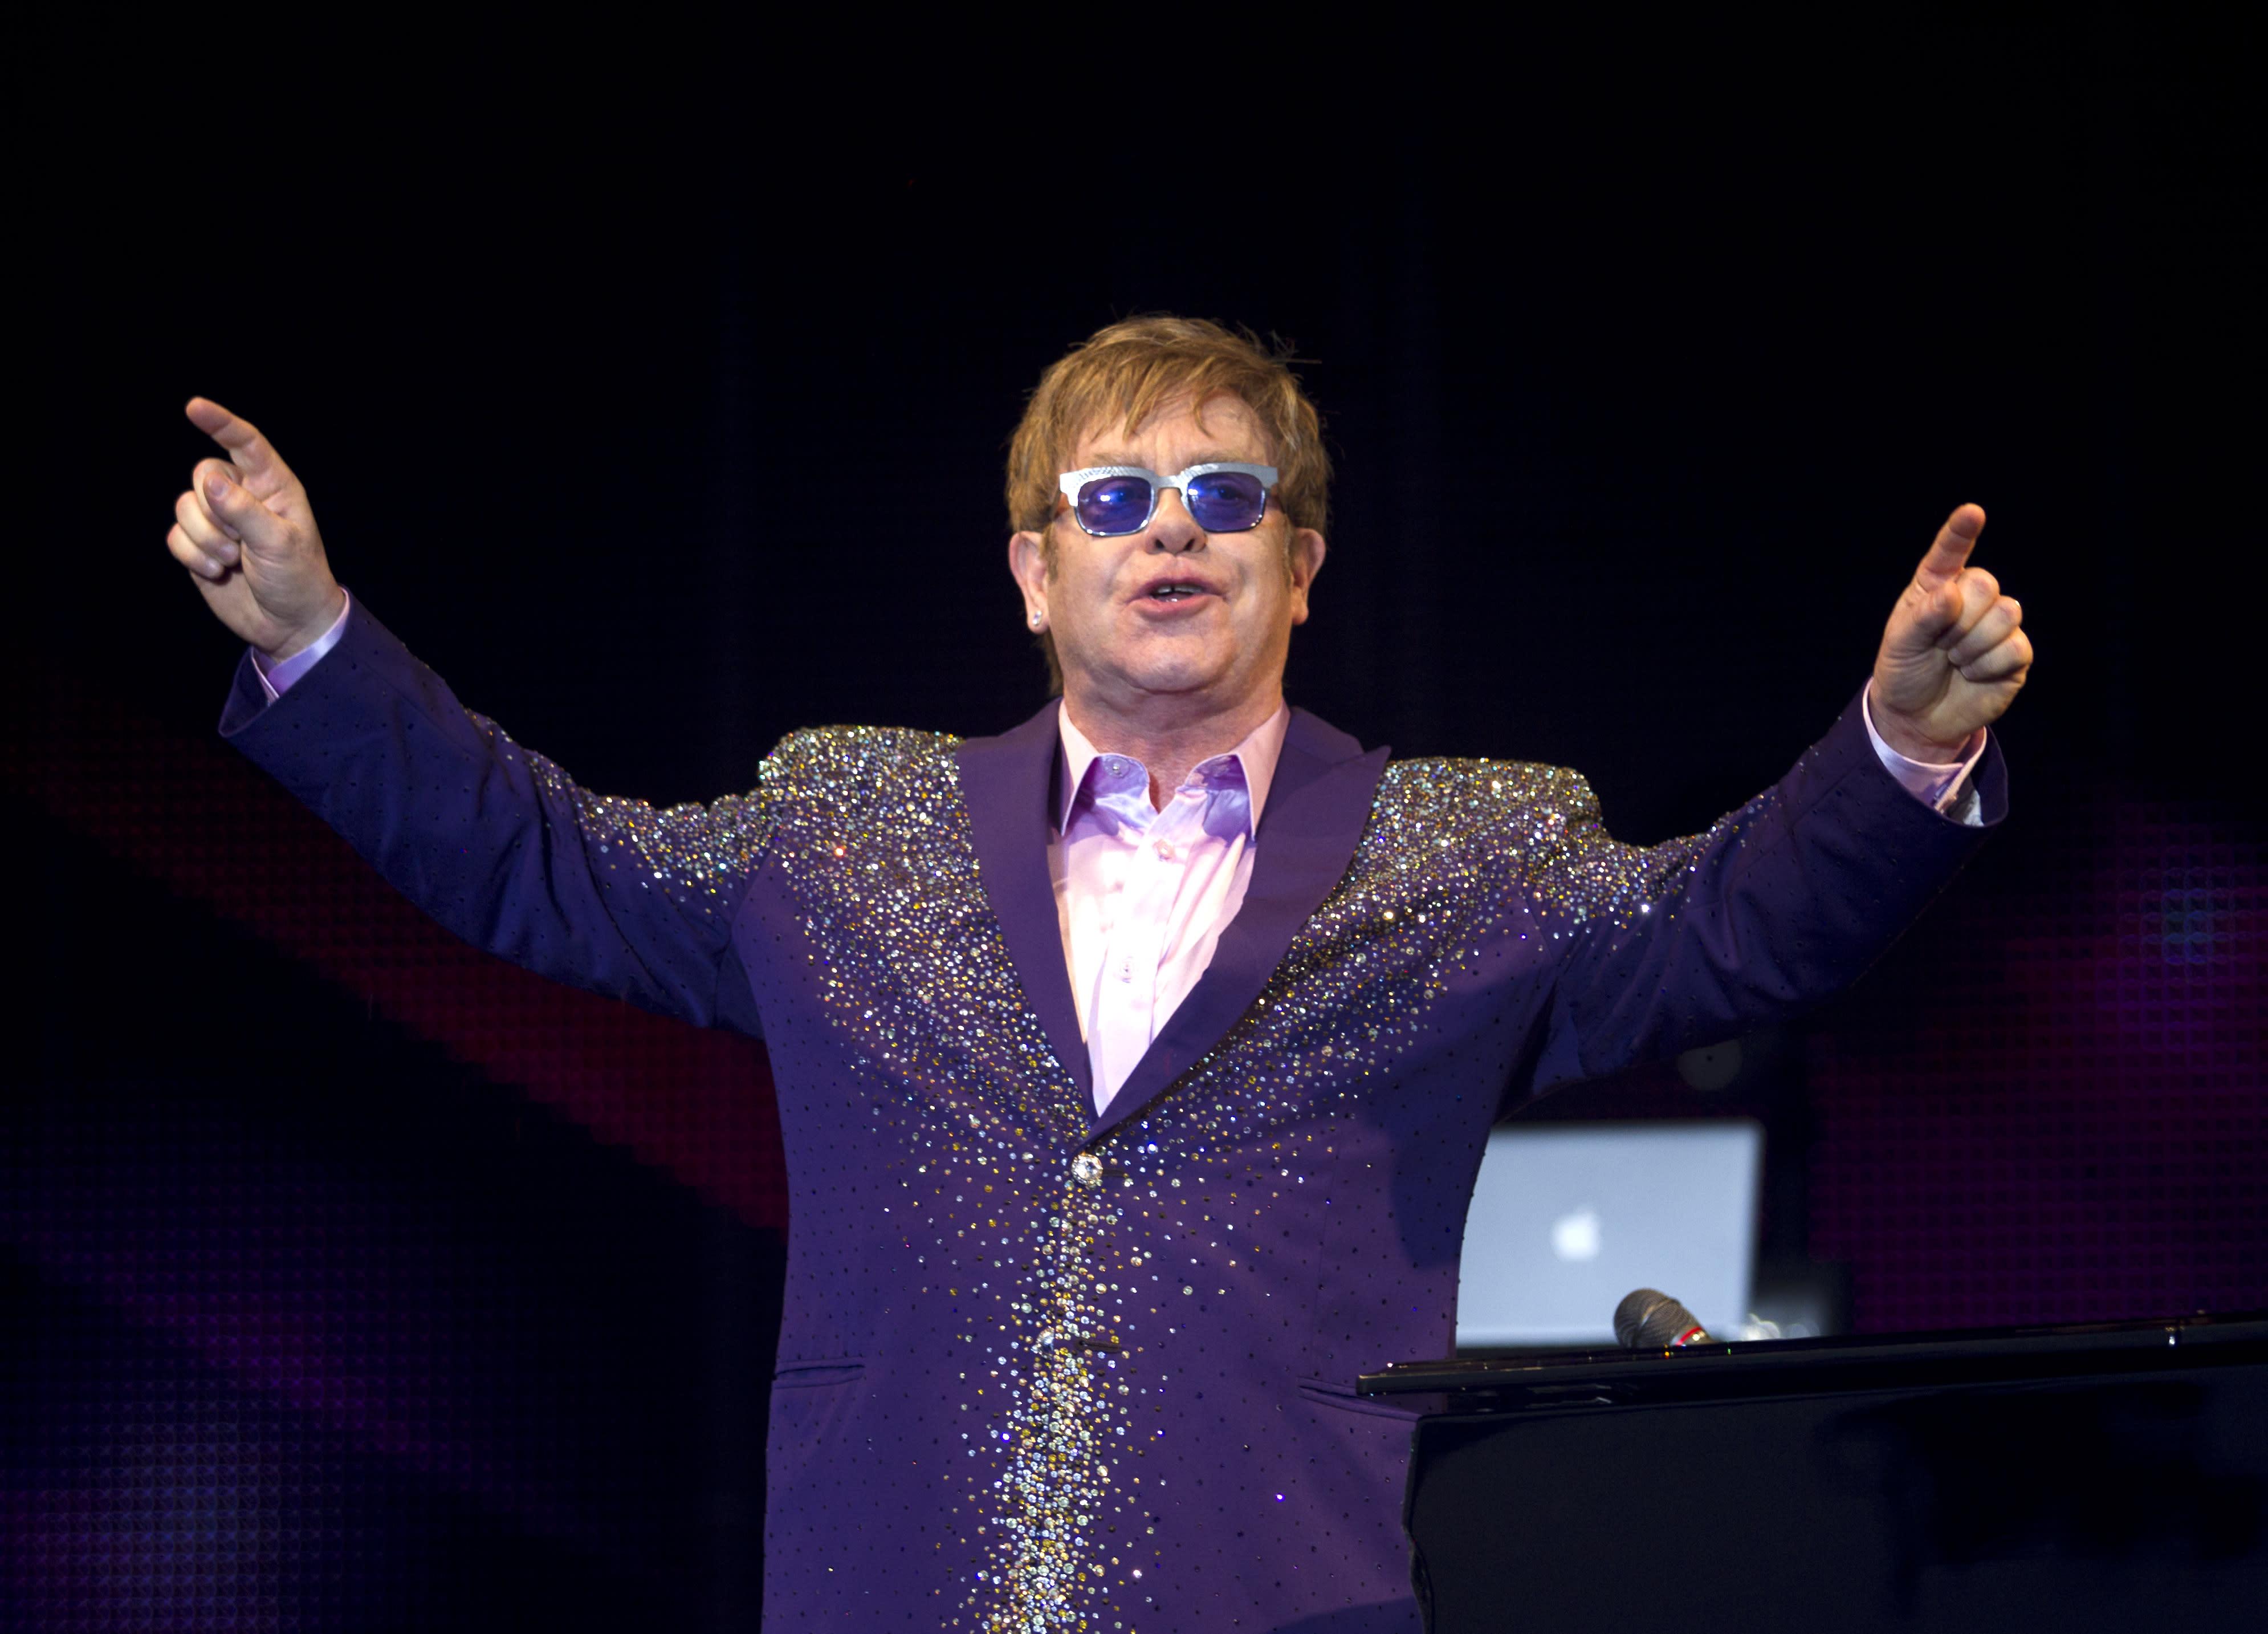 British singer Elton John performs at the Ibiza123 Festival in Sant Antoni de Portmany on the Balearic island of Ibiza on July 2, 2012